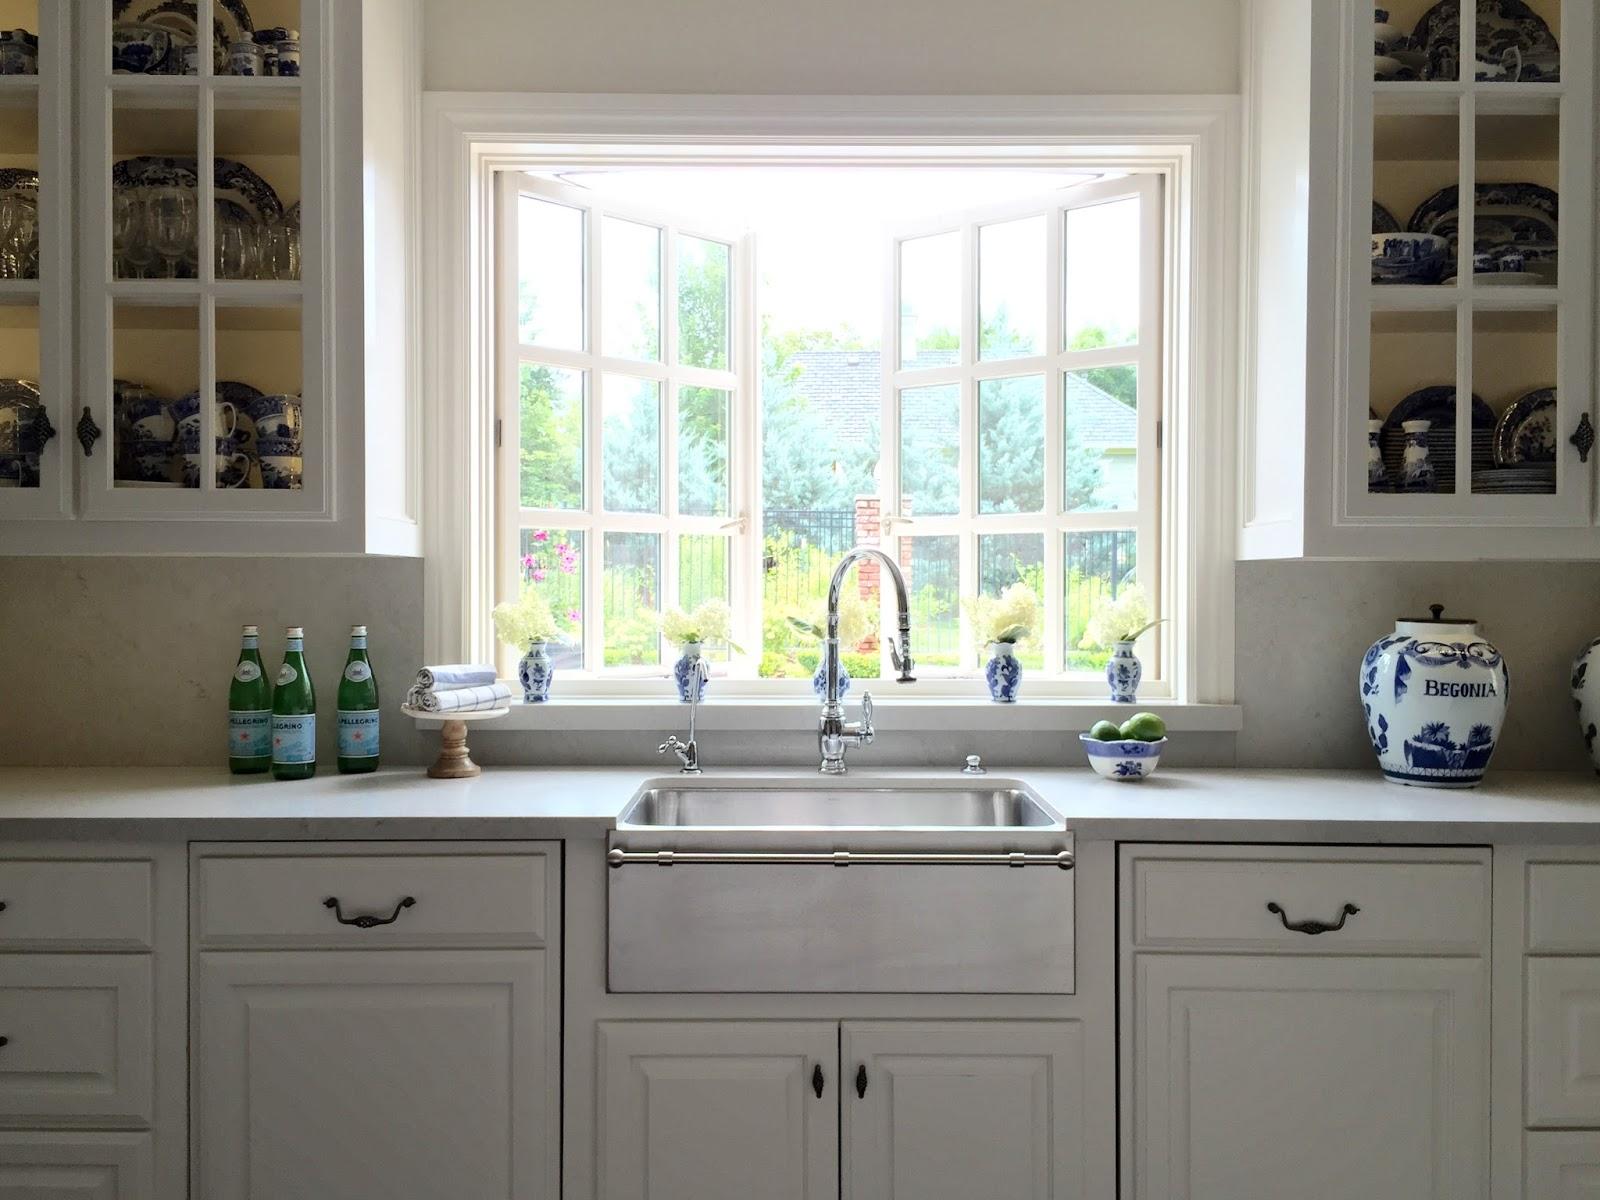 kitchen remodel okc outdoor exhaust hoods eleven gables as featured in design